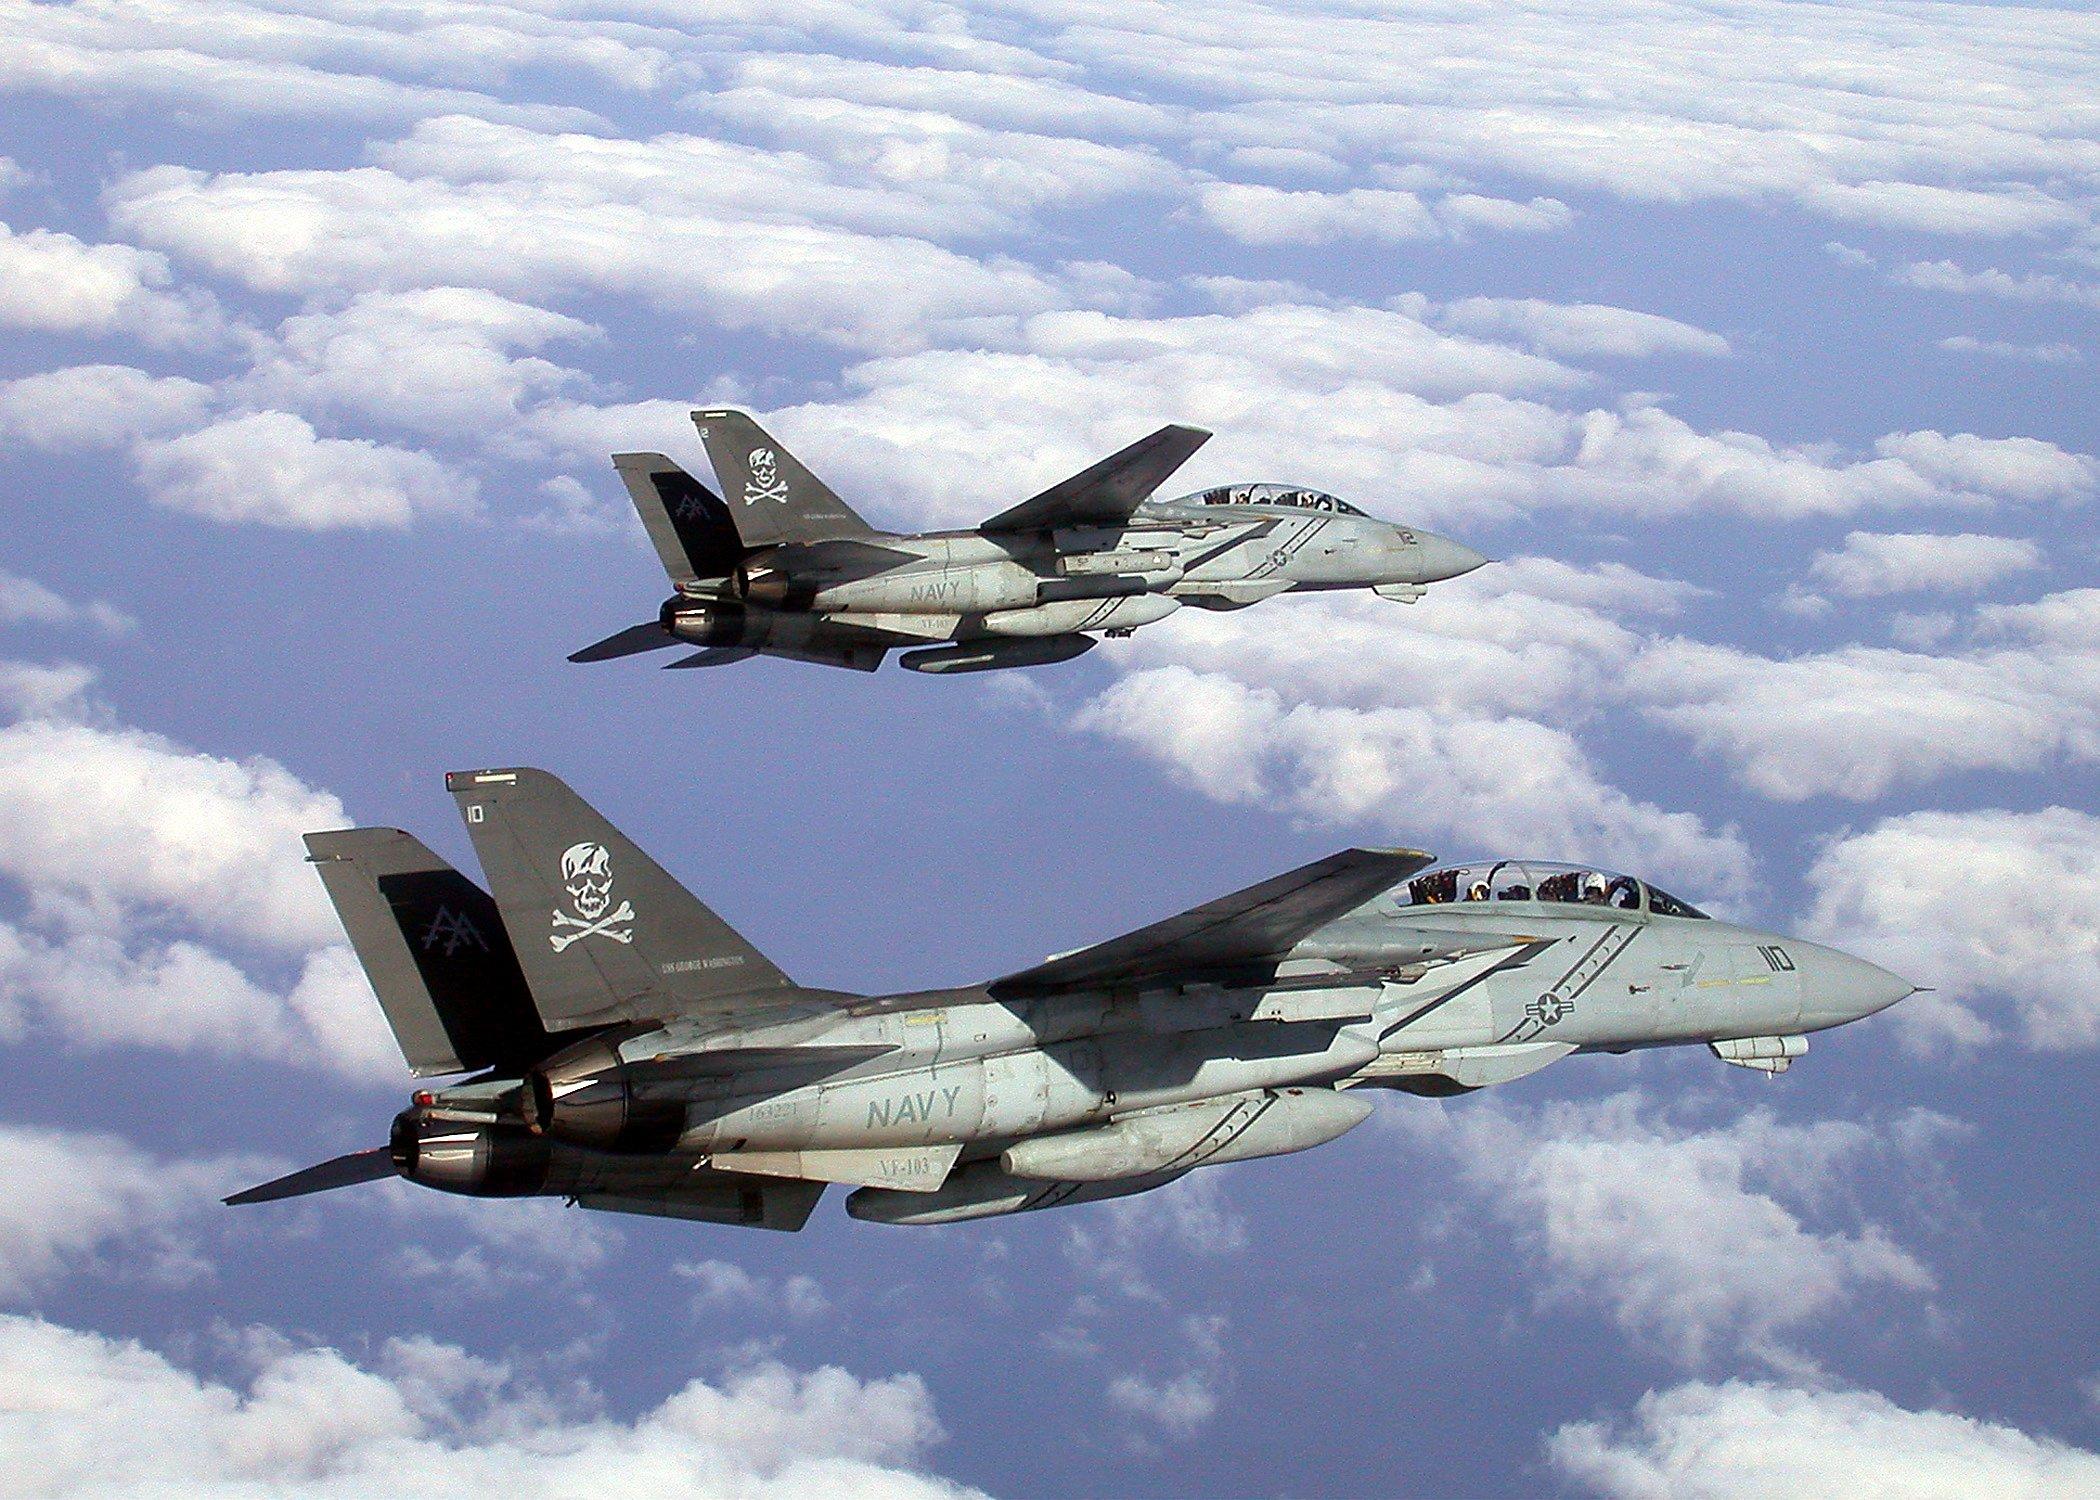 Aircraft F 14 Tomcat Free Wallpaper Wallpaperjam Com